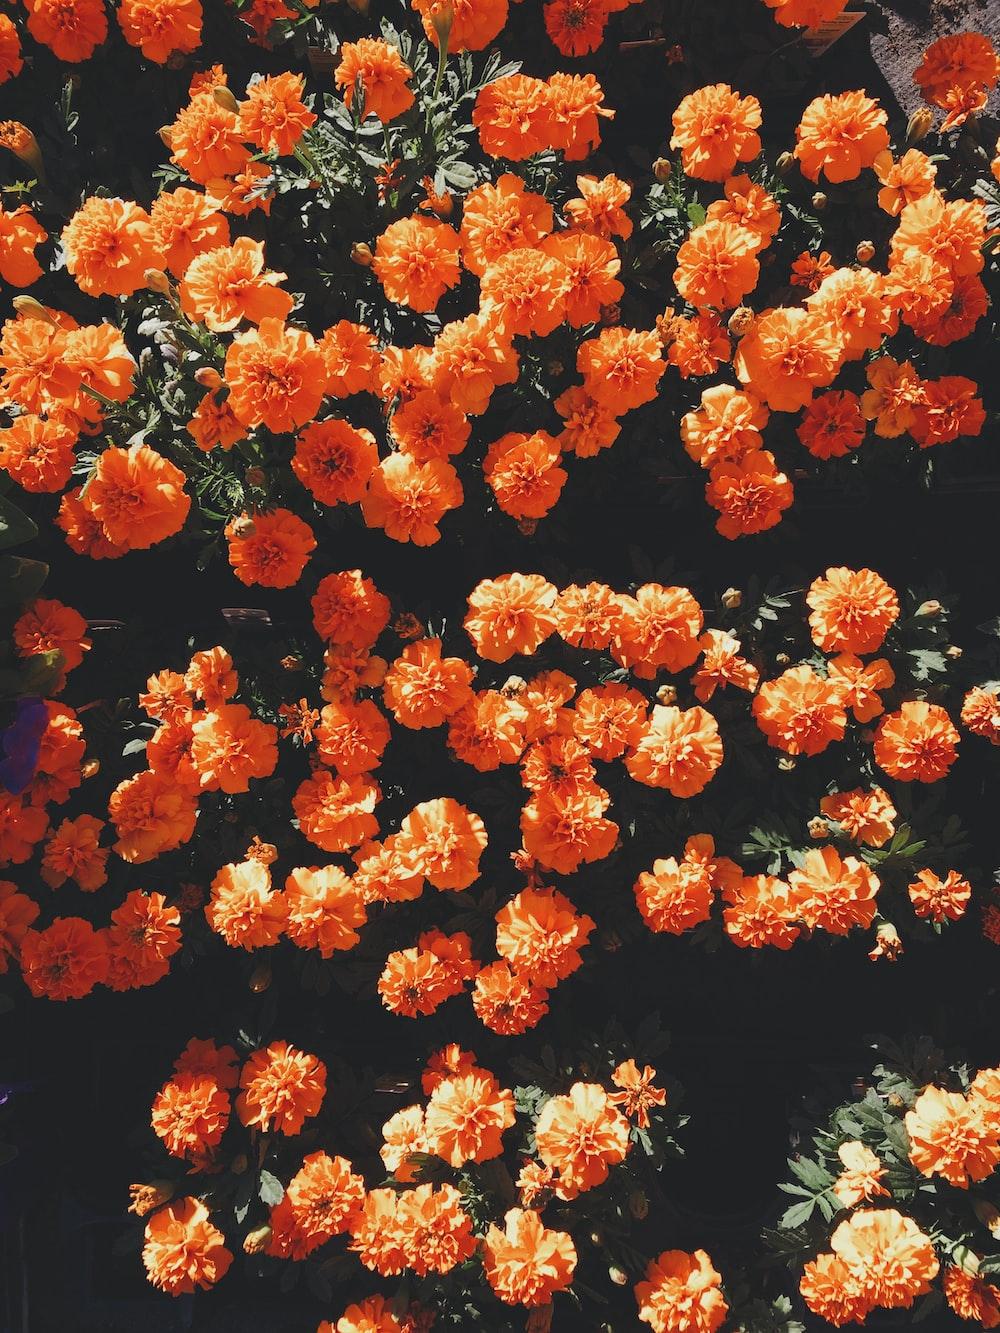 Captivating Orange Flower Bed Photo By Alex Harvey Alexharvey